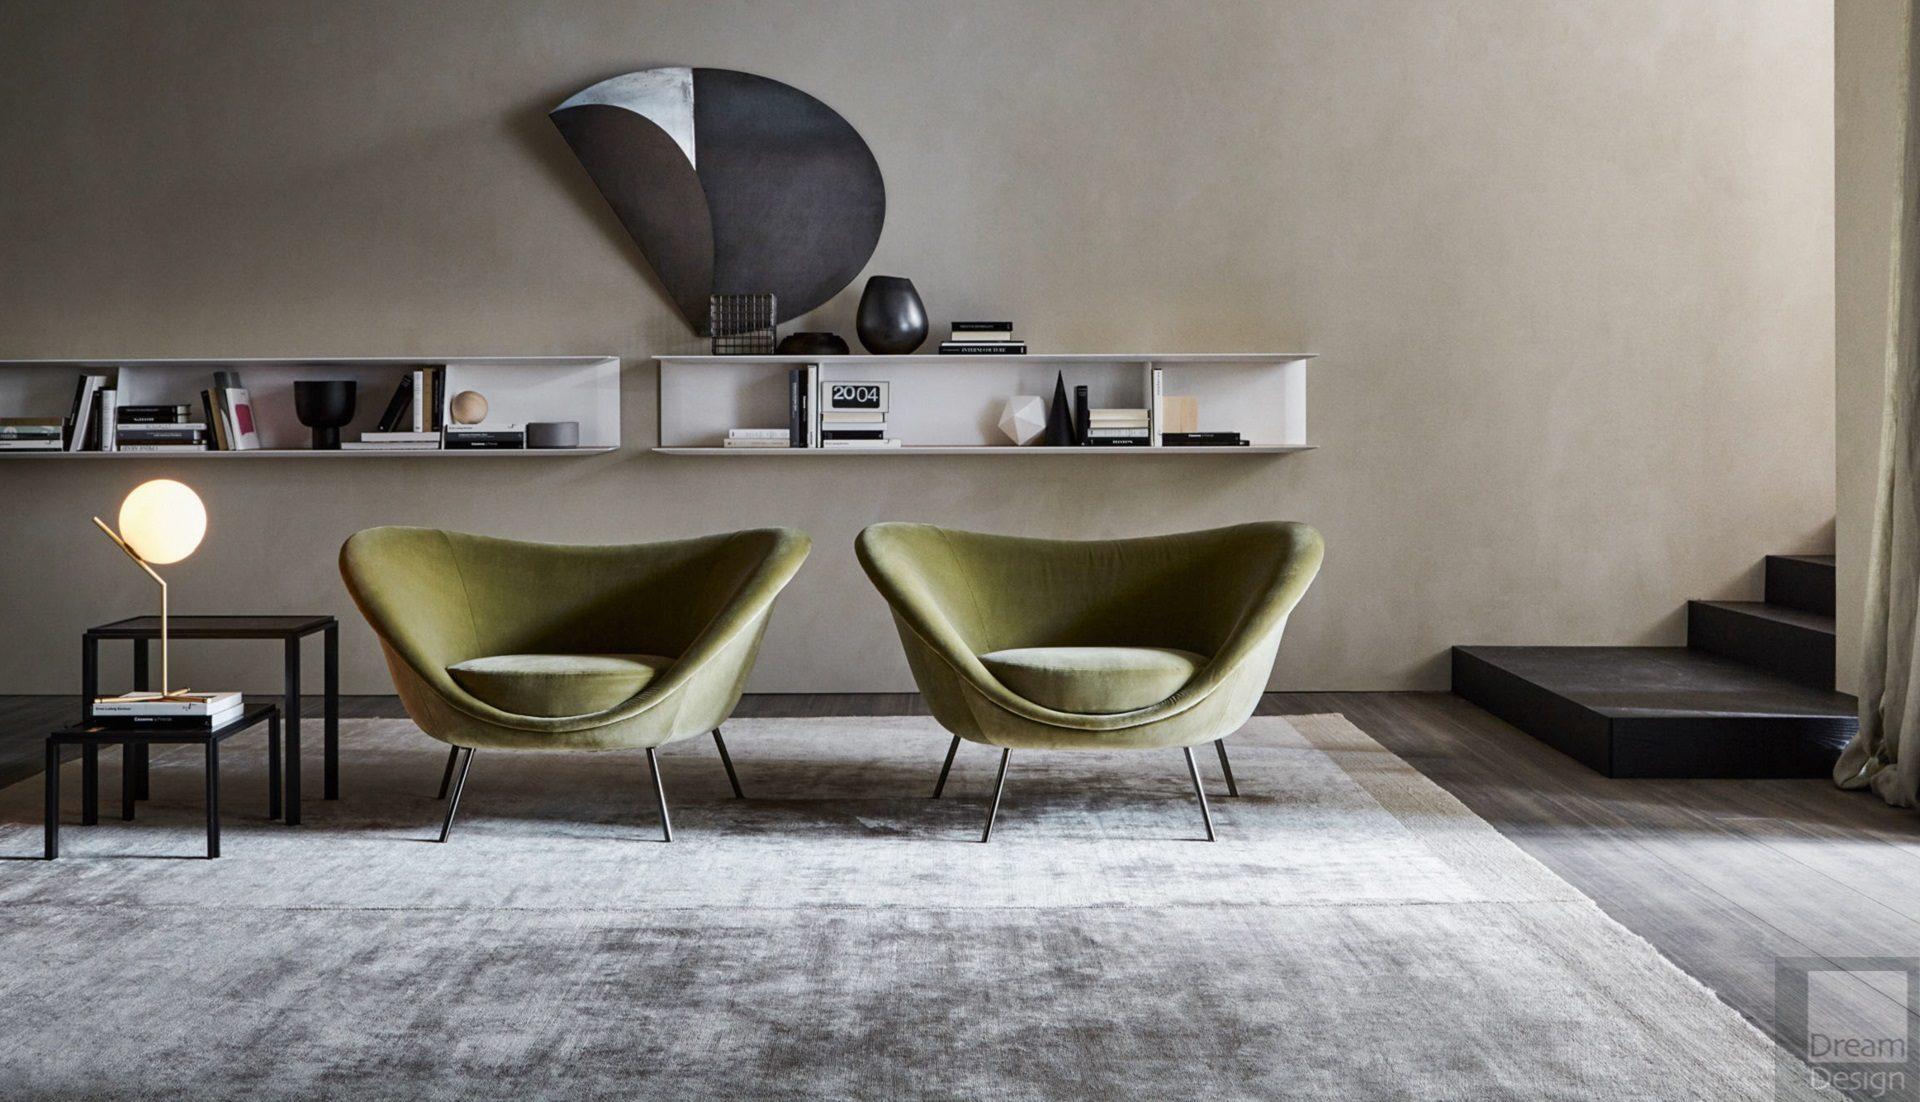 Molteni&C Gio Ponti D.154.2 Armchair